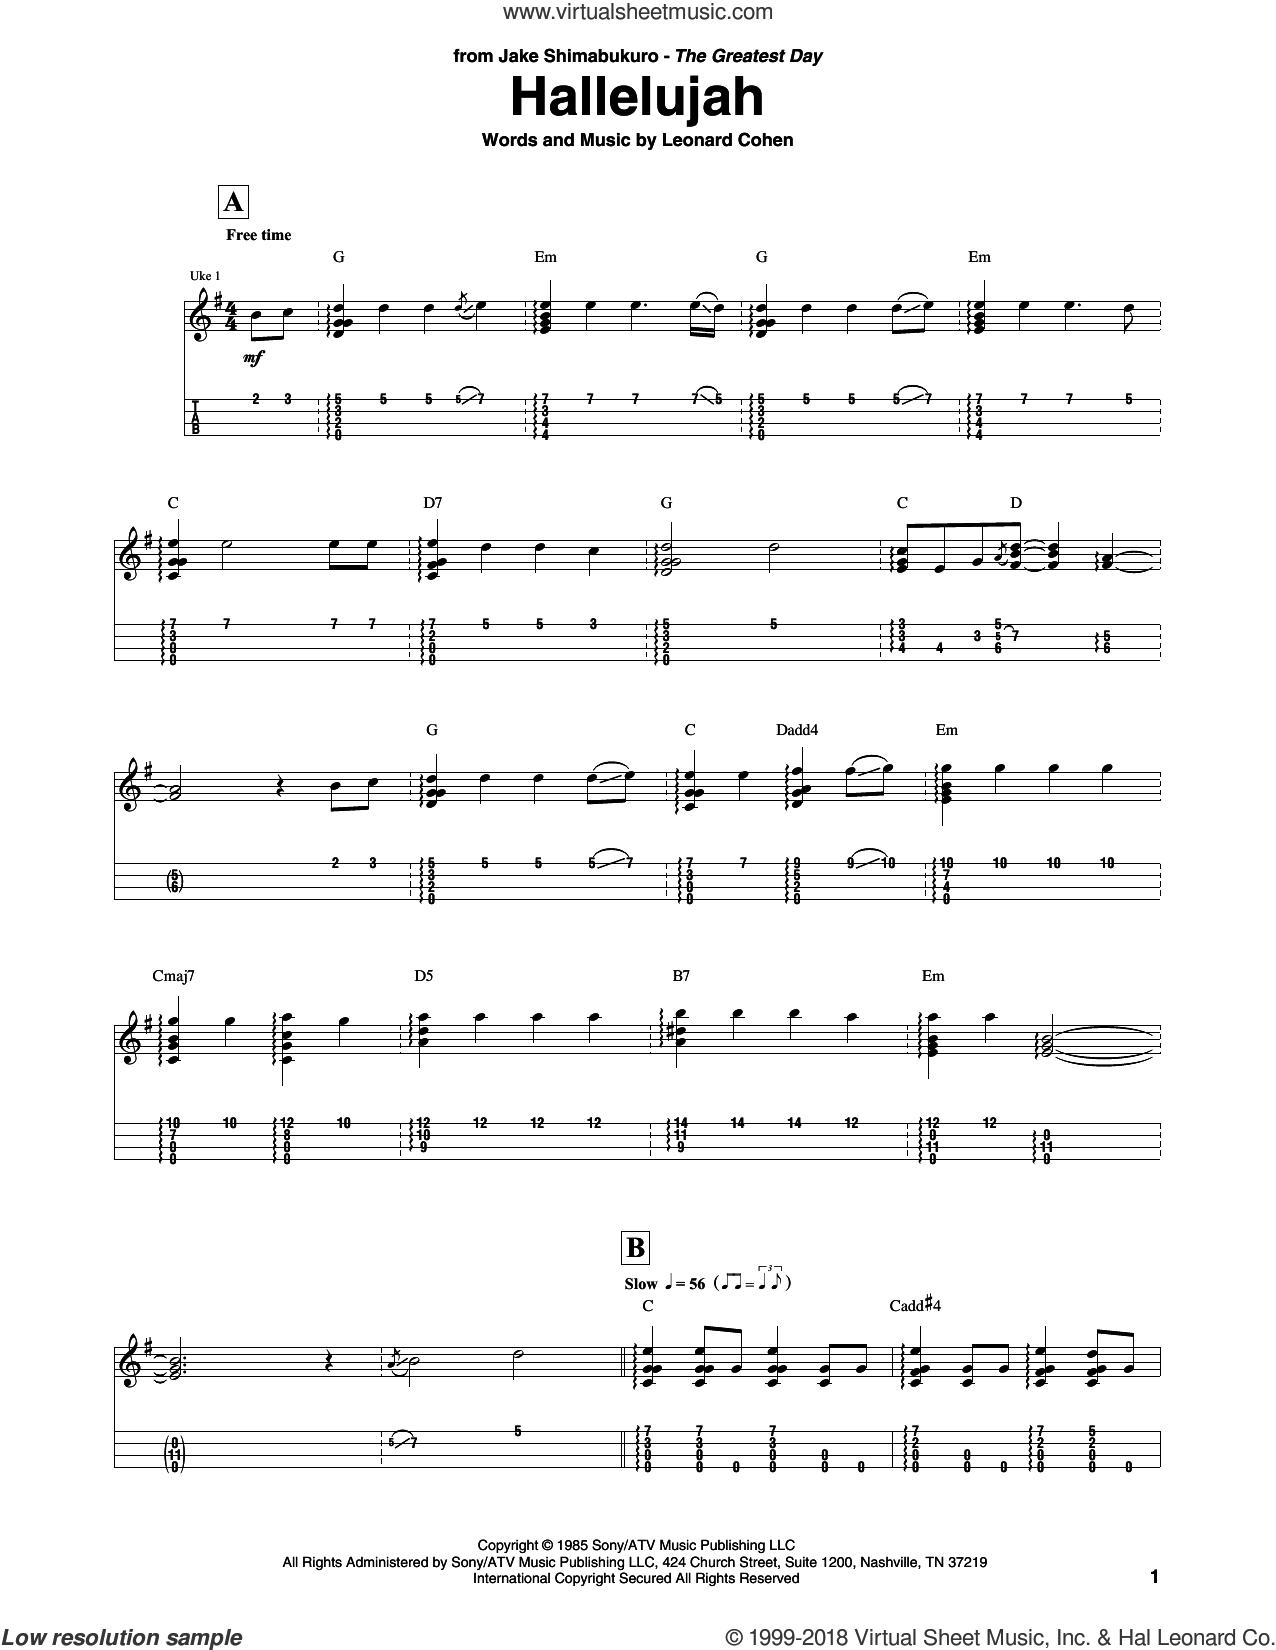 Hallelujah (arr. Jake Shimabukuro) sheet music for ukulele (tablature) by Leonard Cohen and Jake Shimabukuro, intermediate skill level